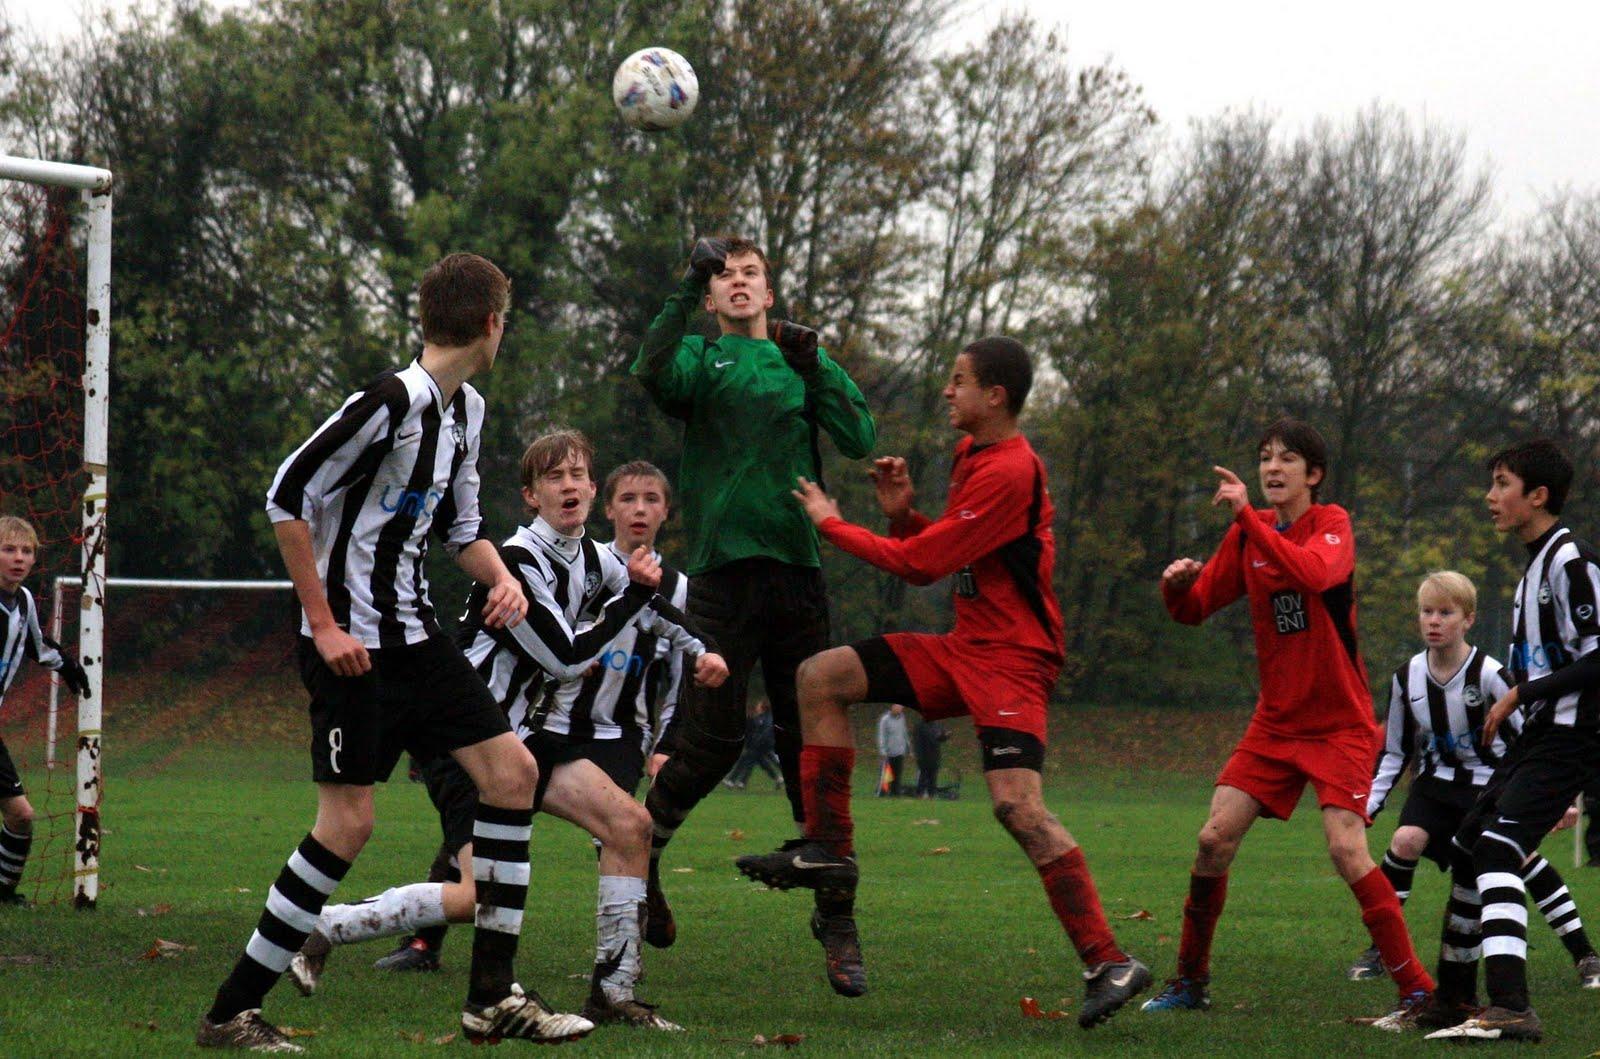 Brockham Badgers Fc Matchday Blog 2010